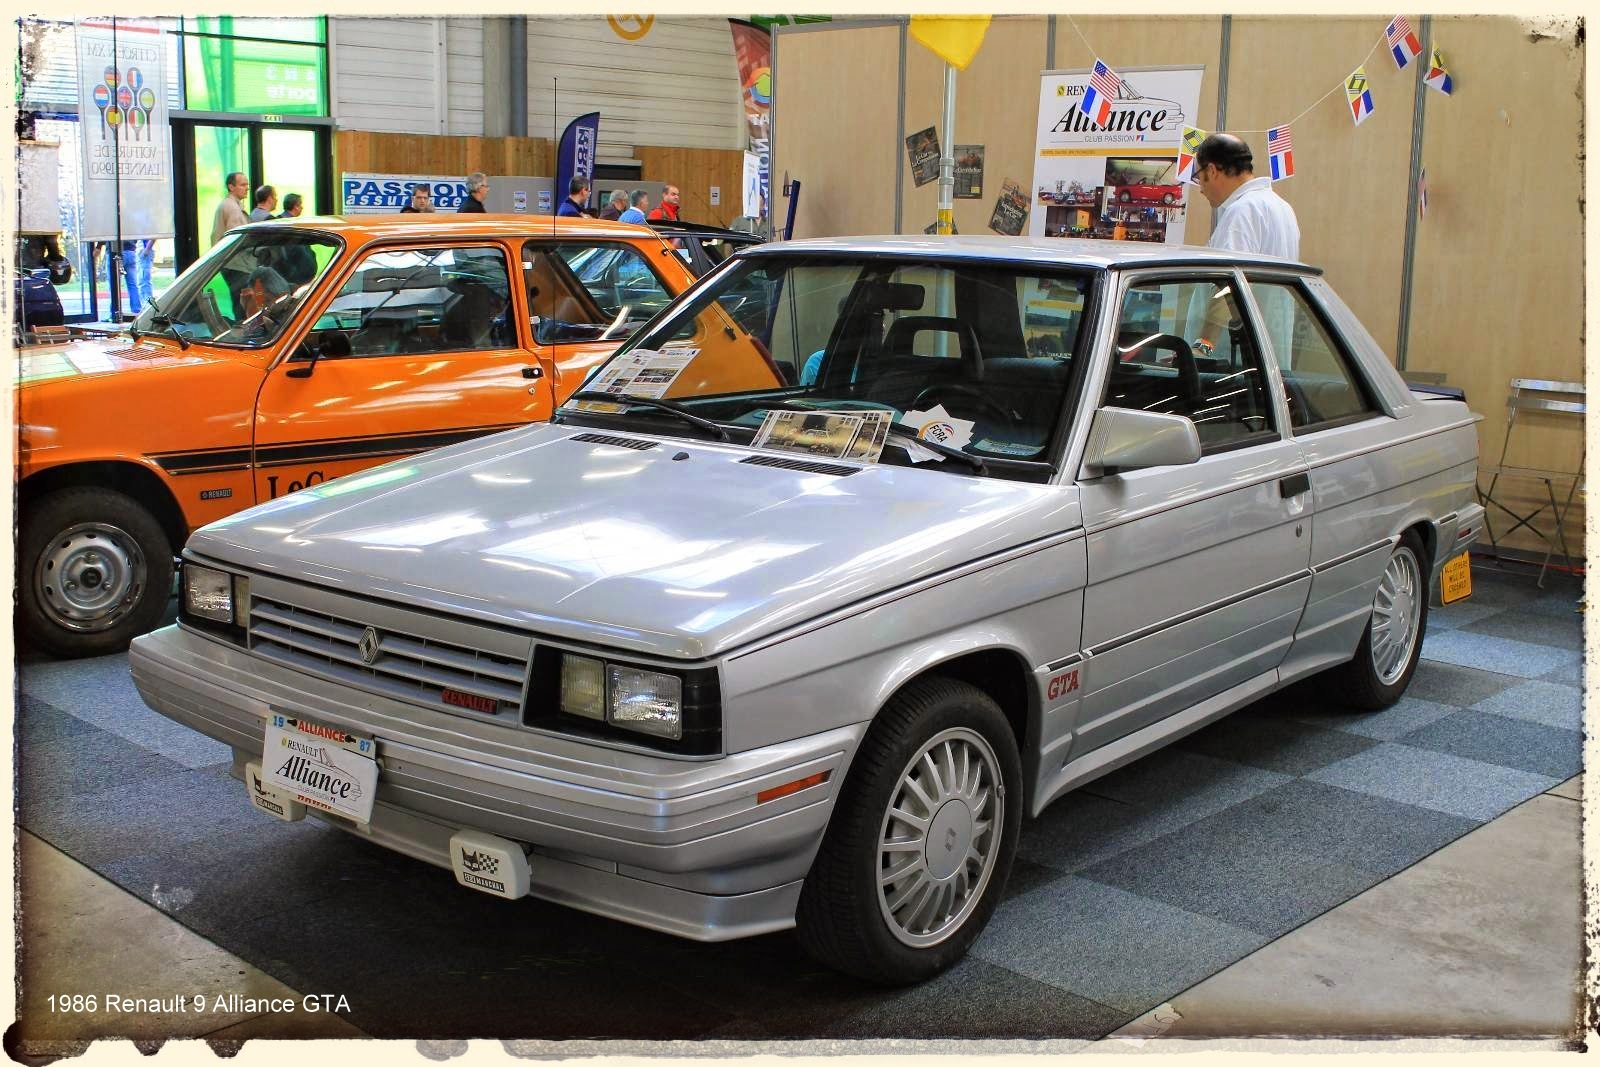 Automédon - 1986 Renault 9 Alliance GTA